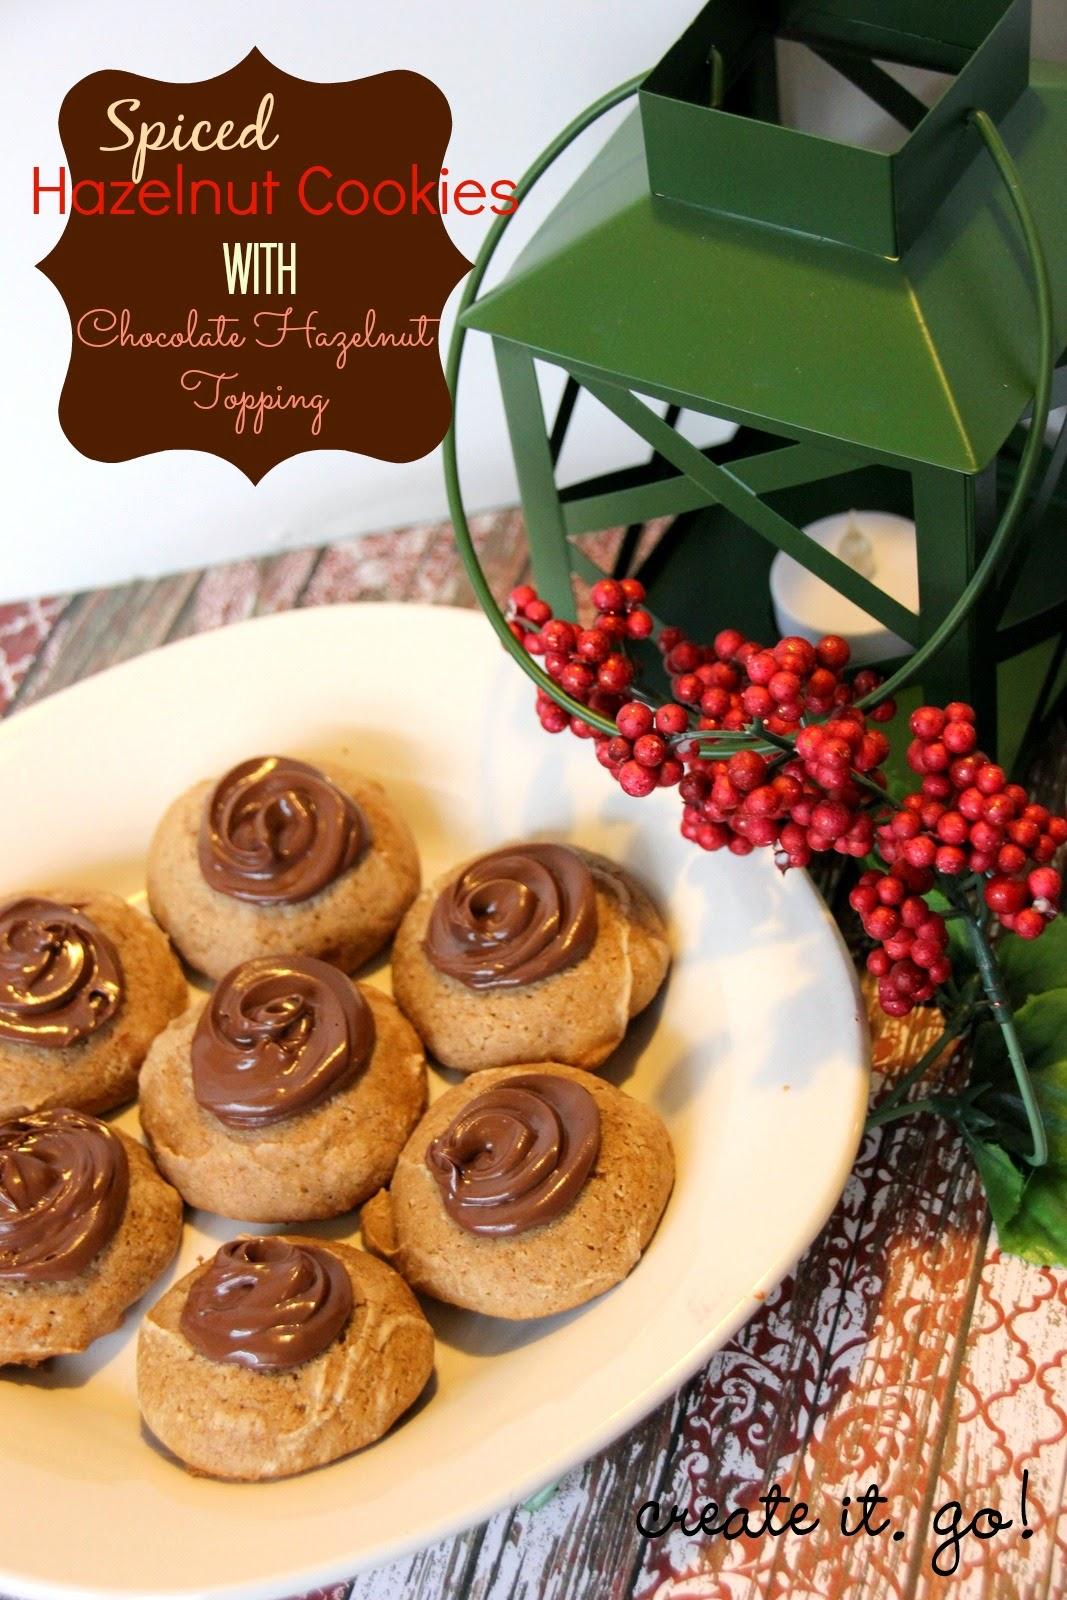 Spiced Hazelnut Cookies with Chocolate Hazelnut Topping ...